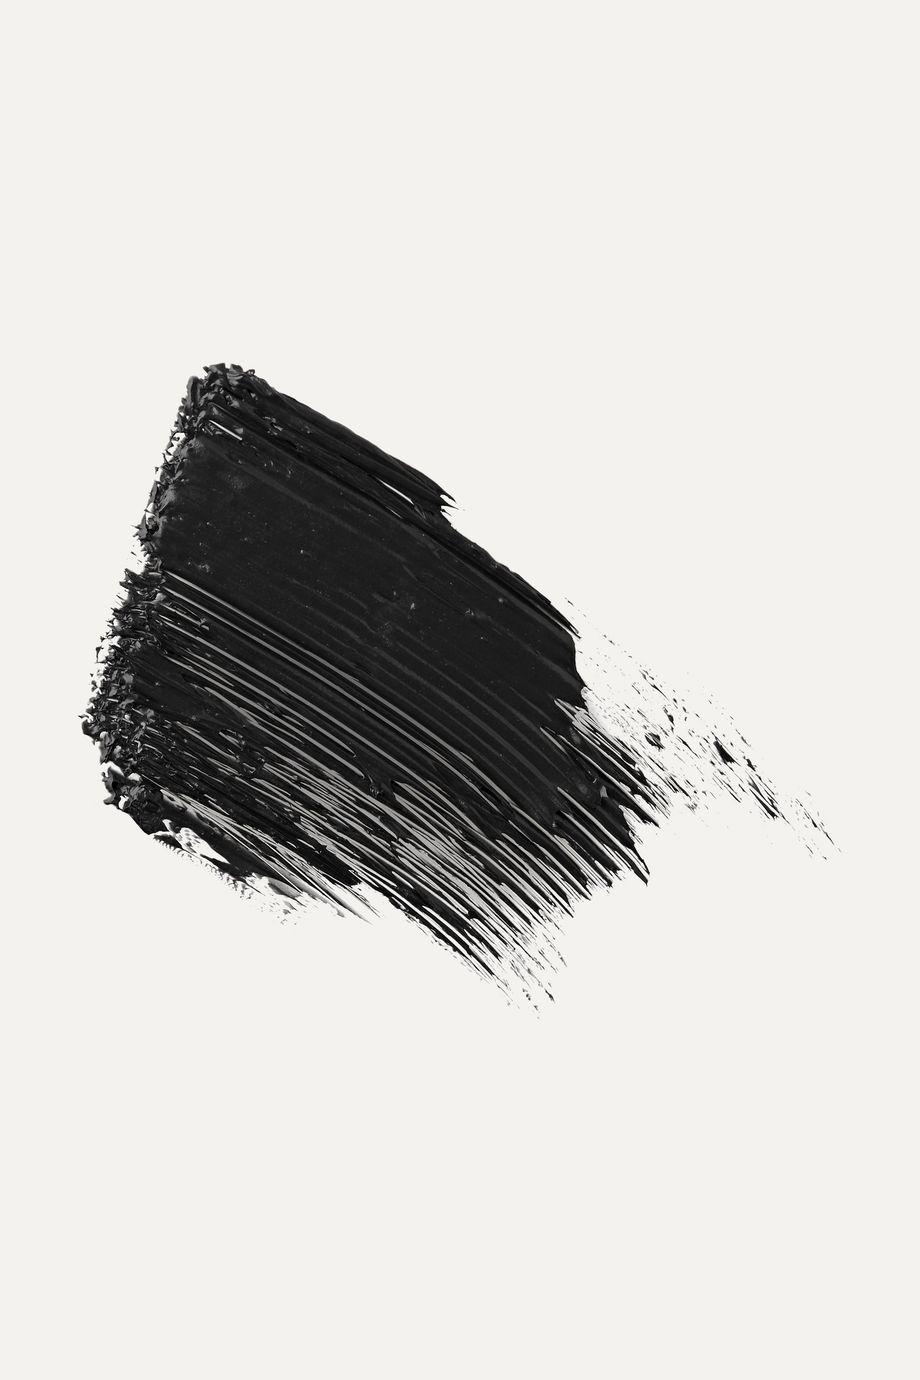 Ilia Limitless Lash Mascara - After Midnight (Black)